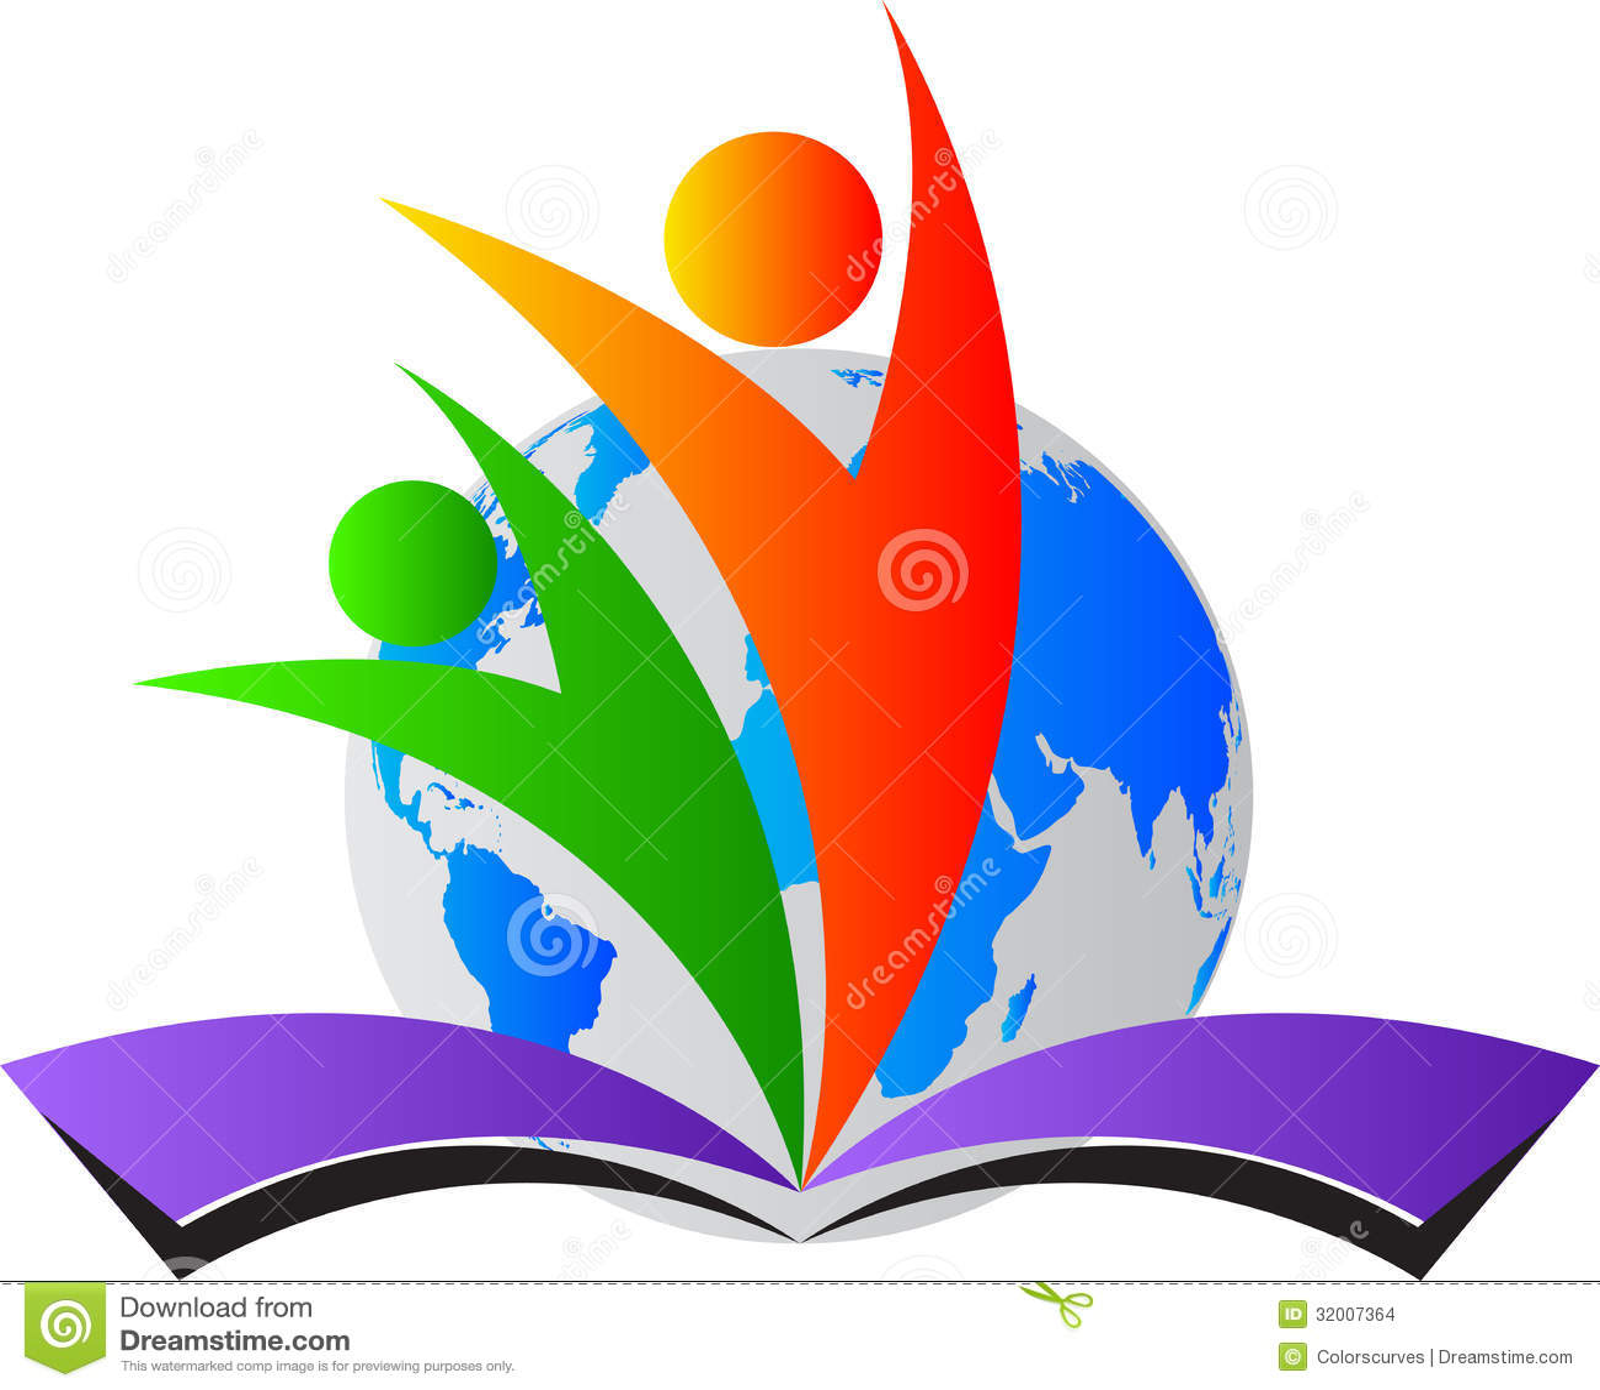 School logo design education logo design private school